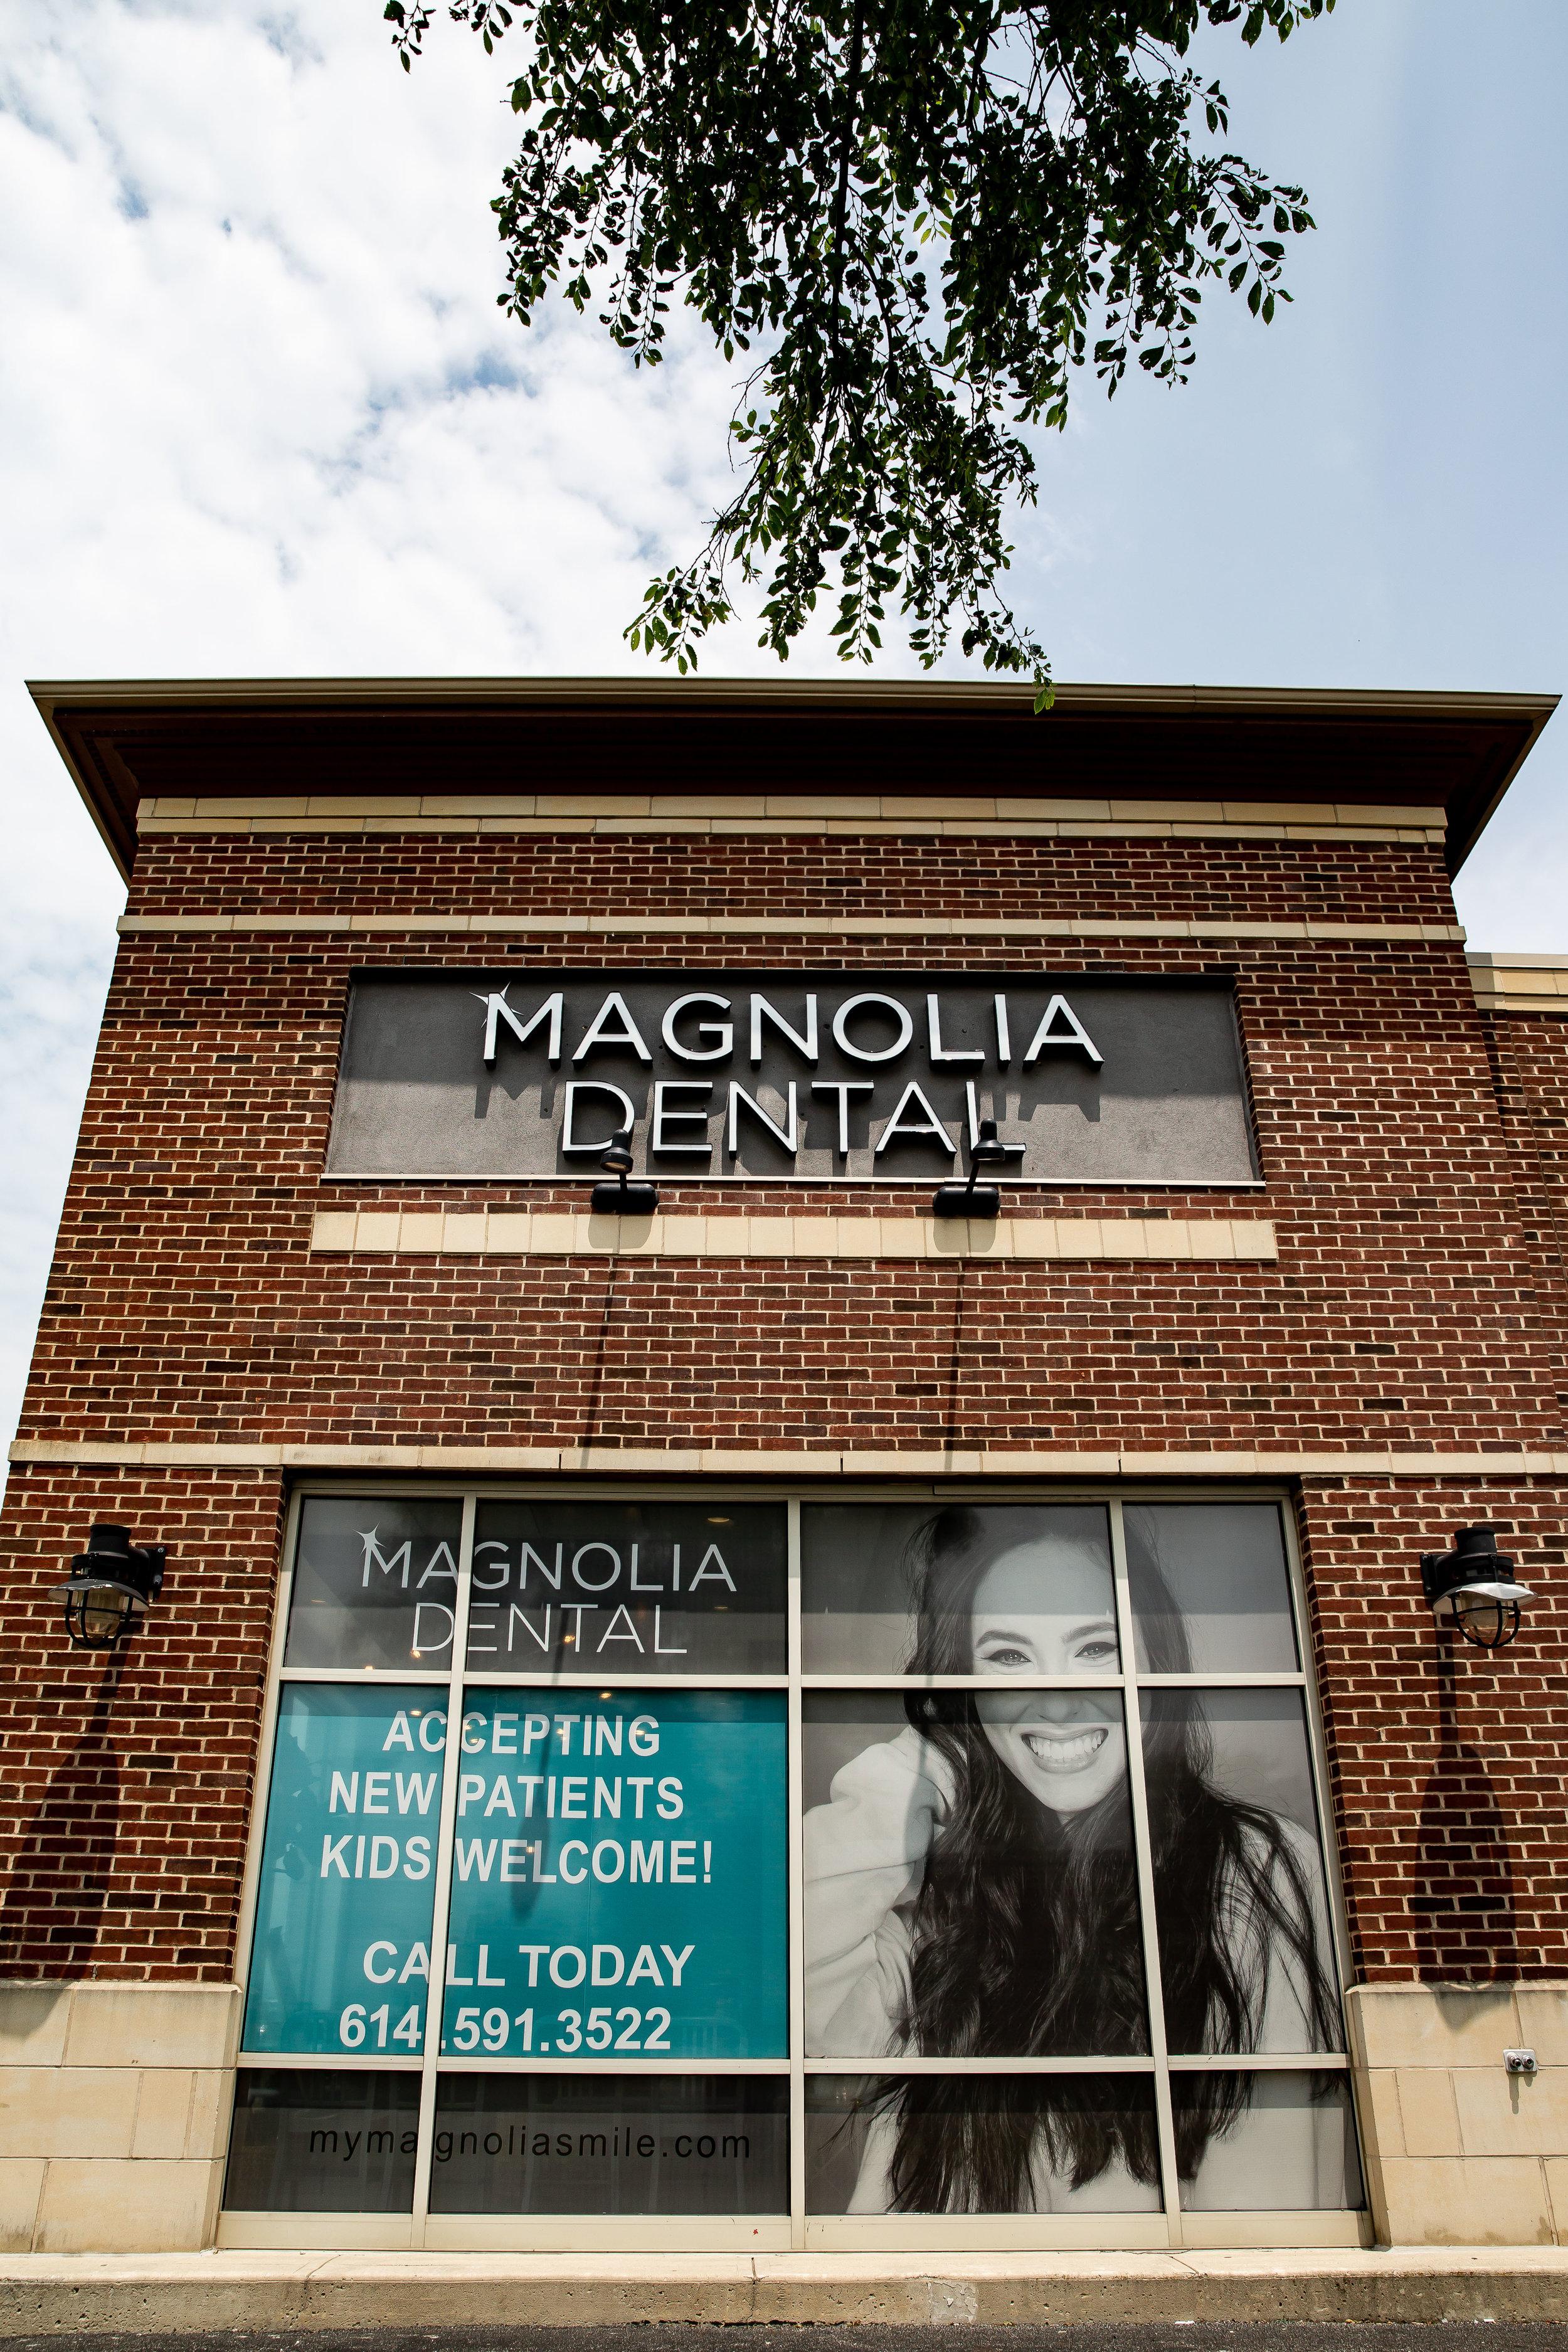 36_LKRphoto_CanalWinchester_Magnolia-2019.jpg